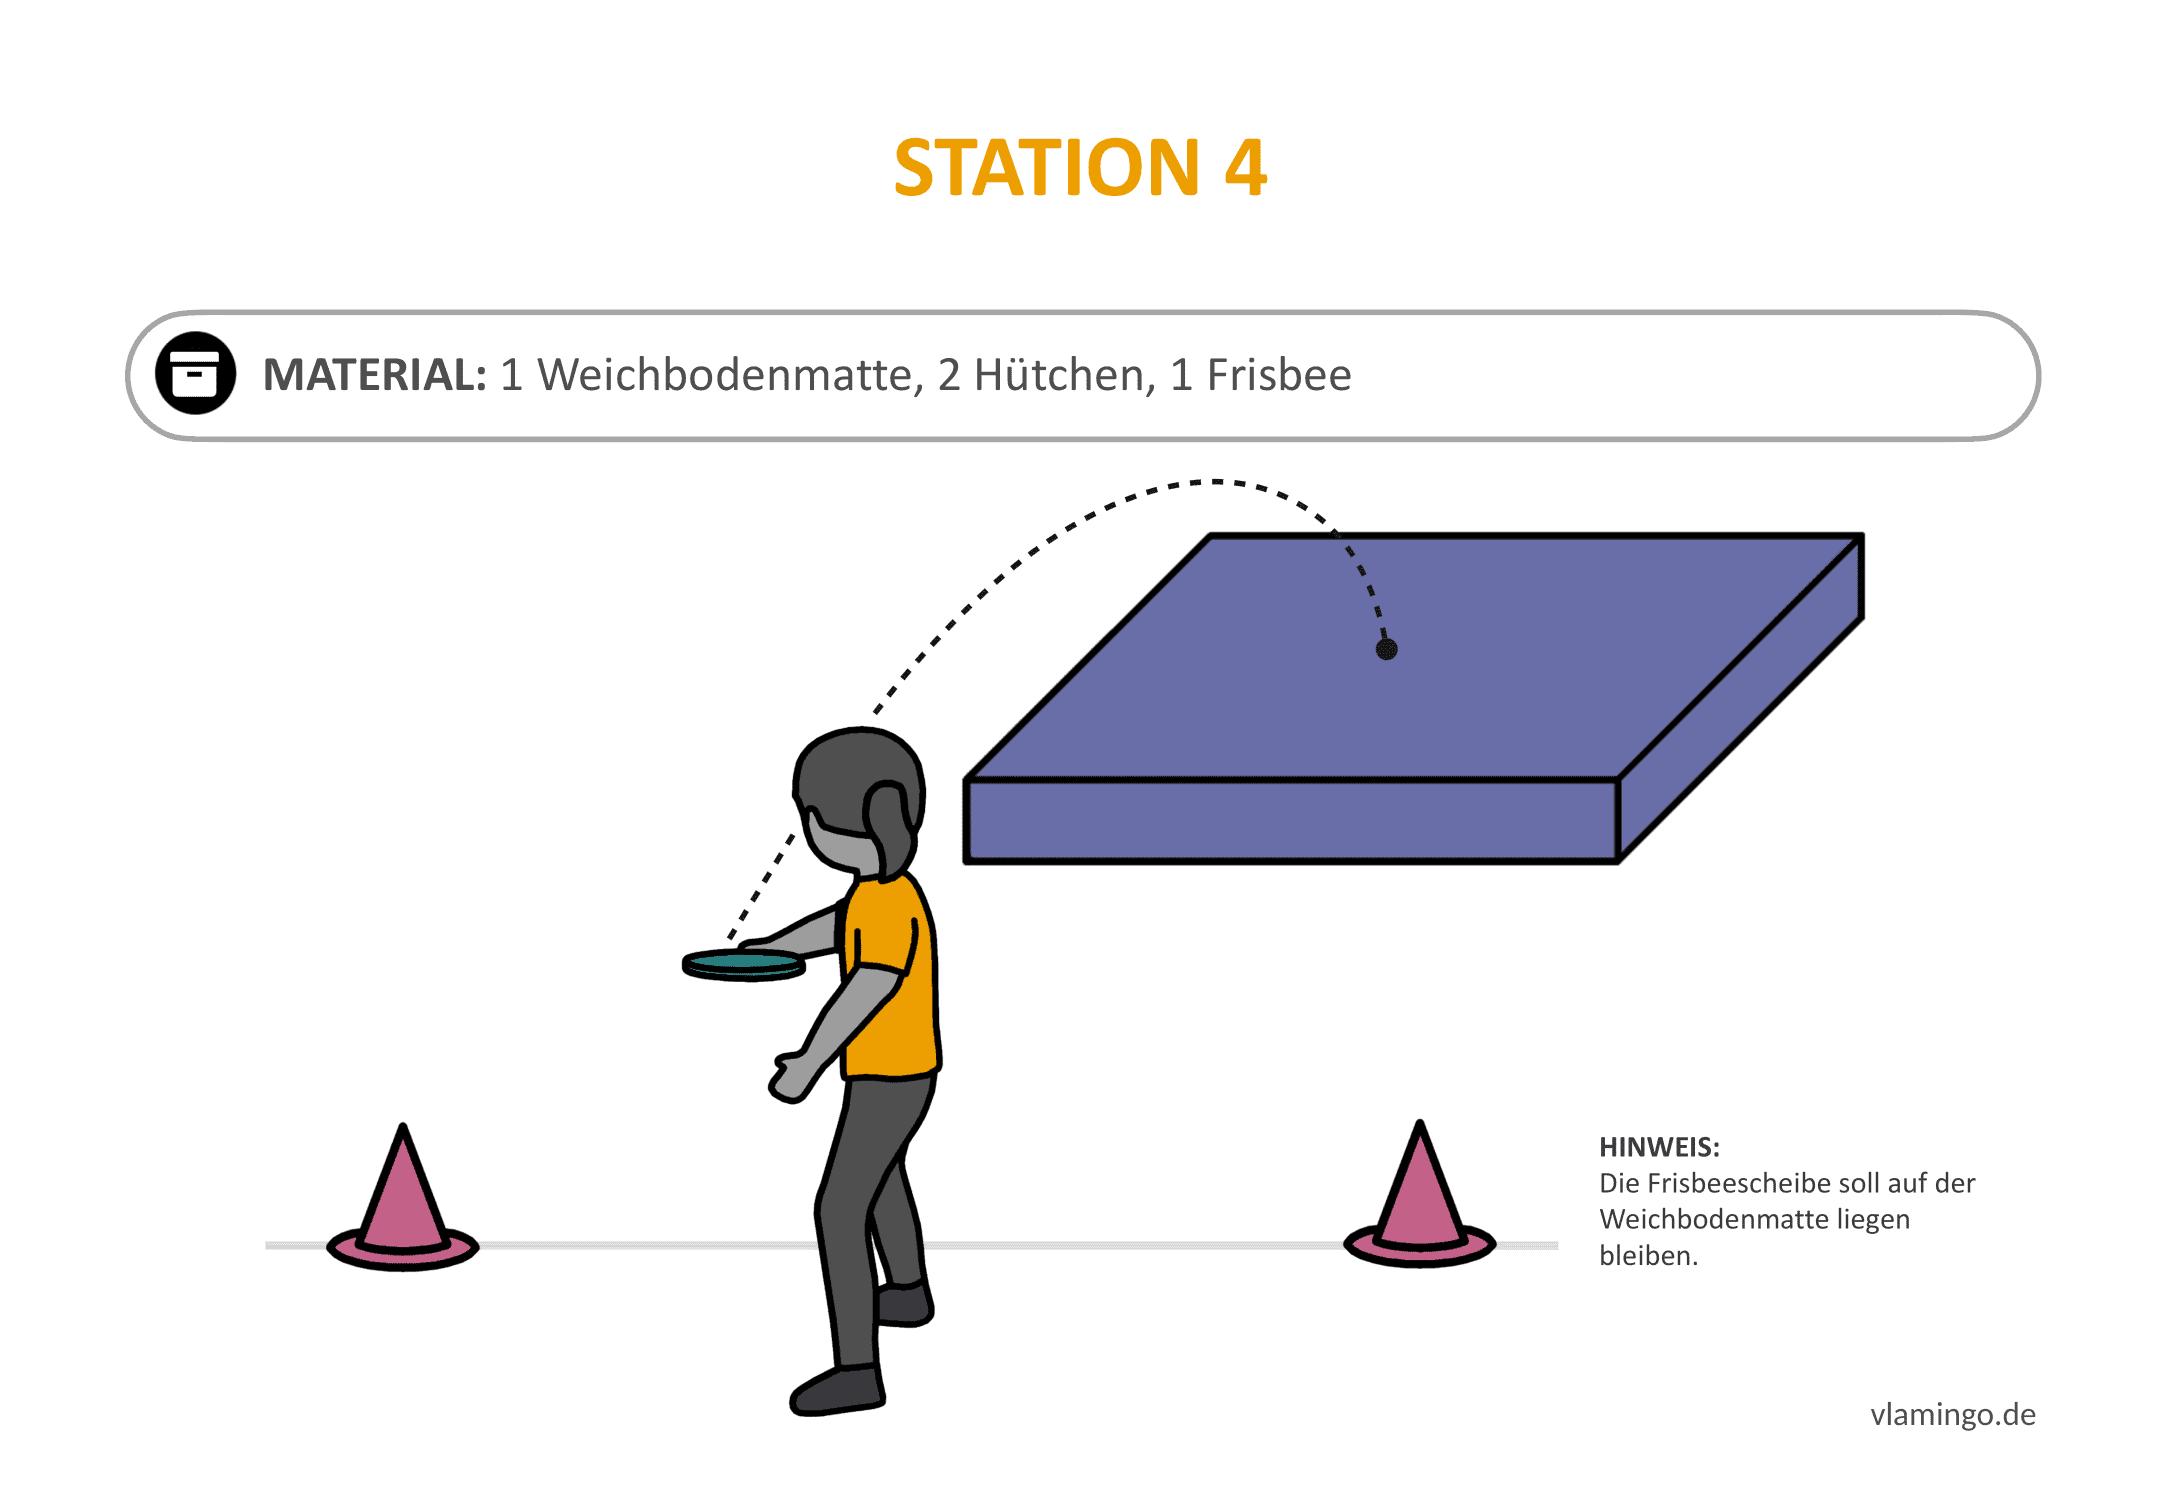 Frisbeegolf (Disc-Golf) - Station 4